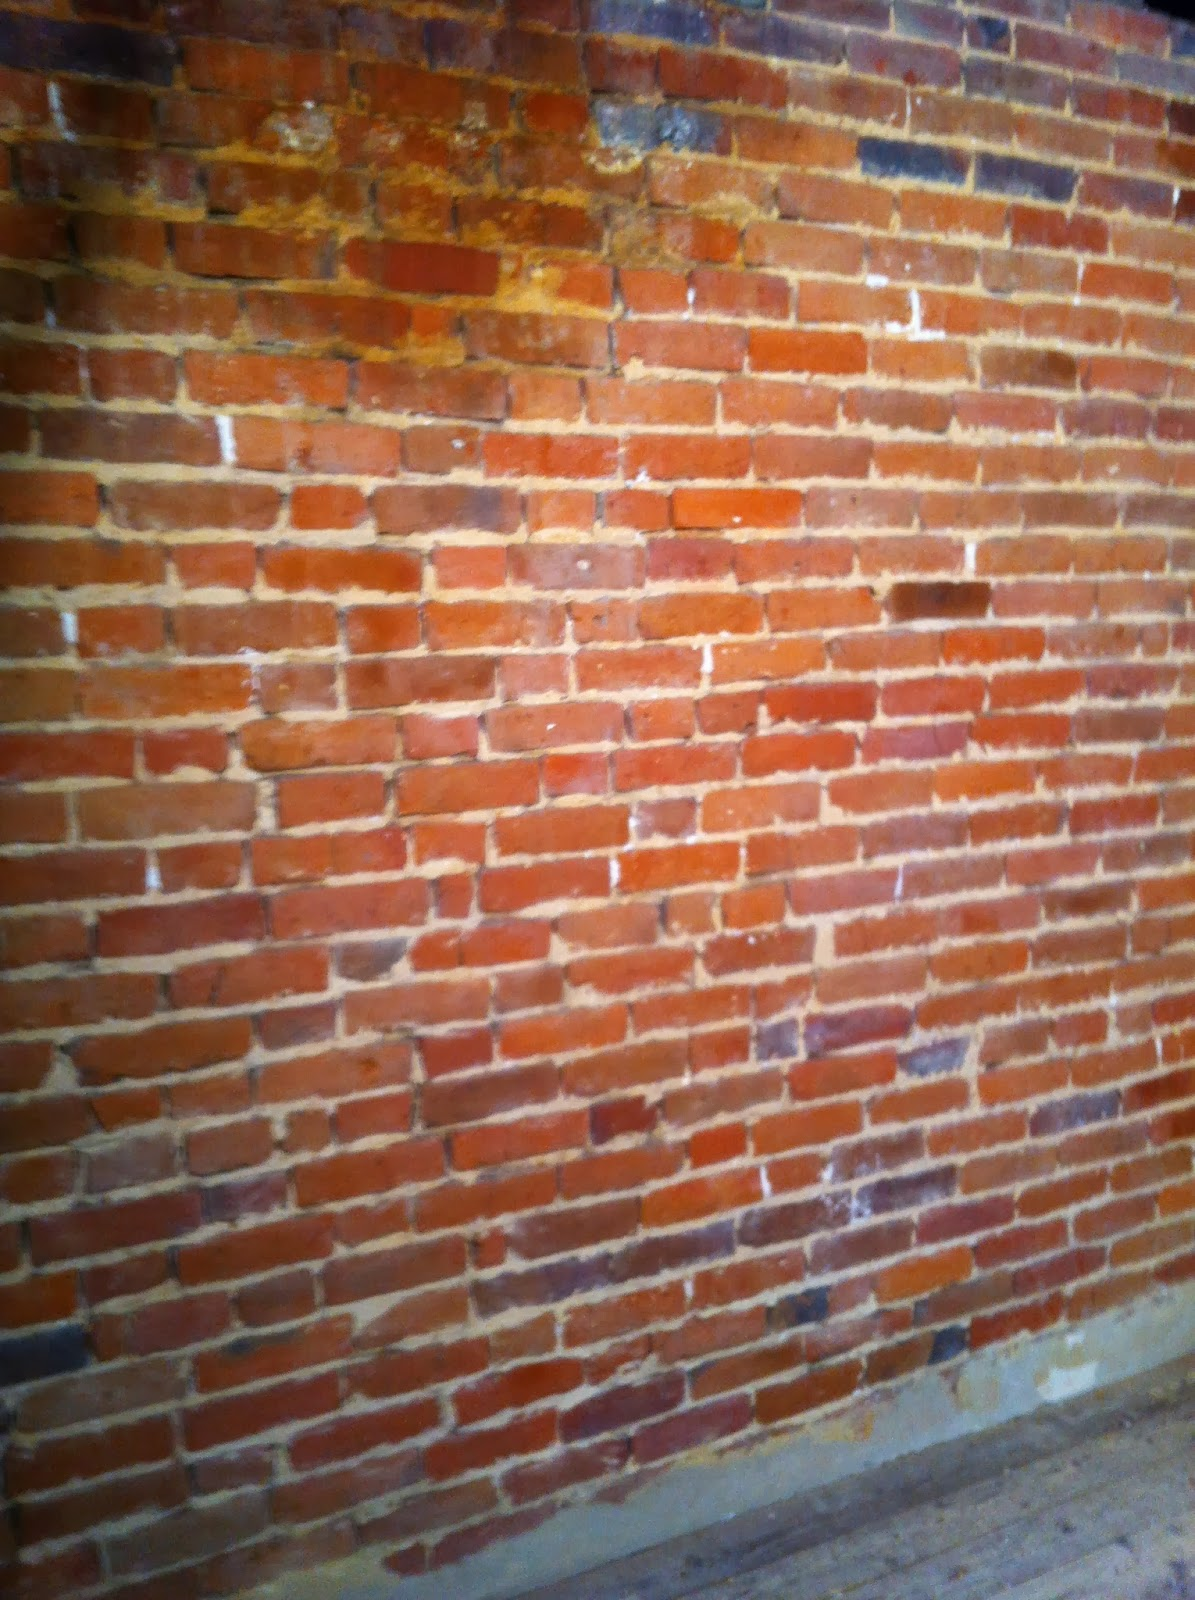 Verveine cognac r nover un mur de briques for Construire mur en brique